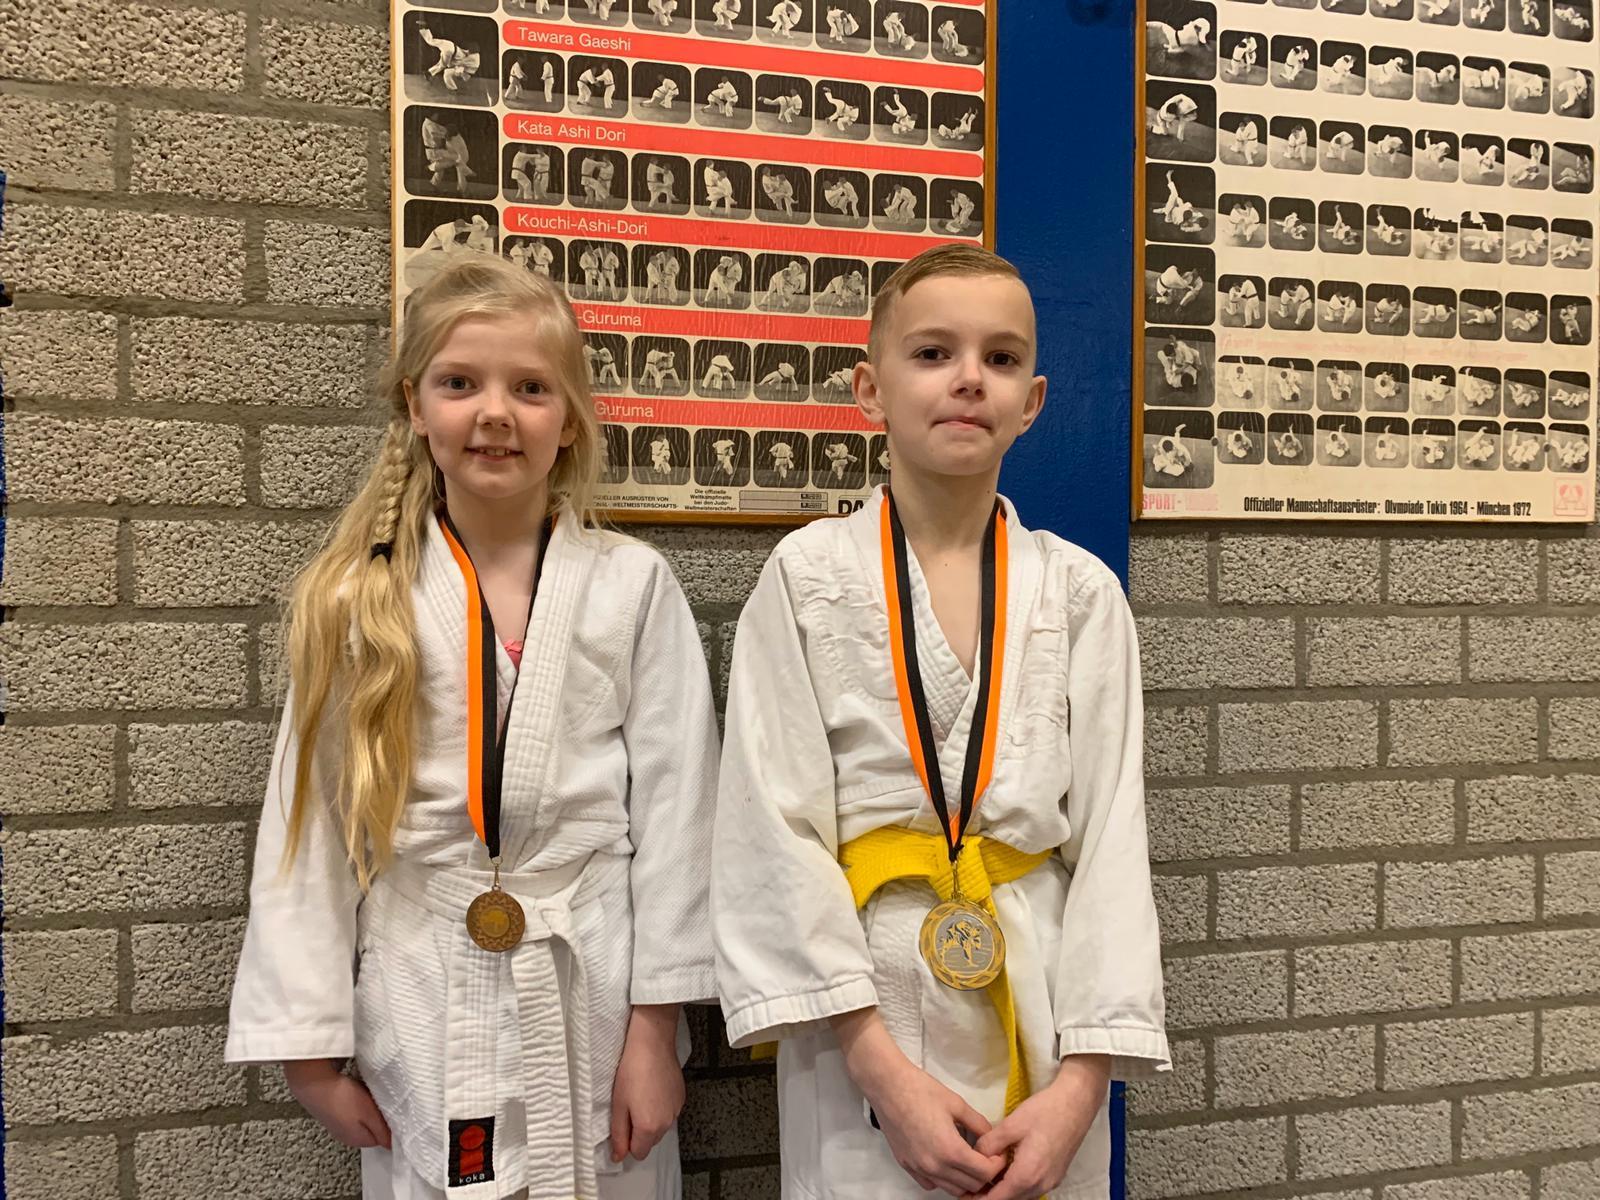 Judoka's Sakaee rijkelijk in de prijzen tijdens regiotoernooi Oude Pekela